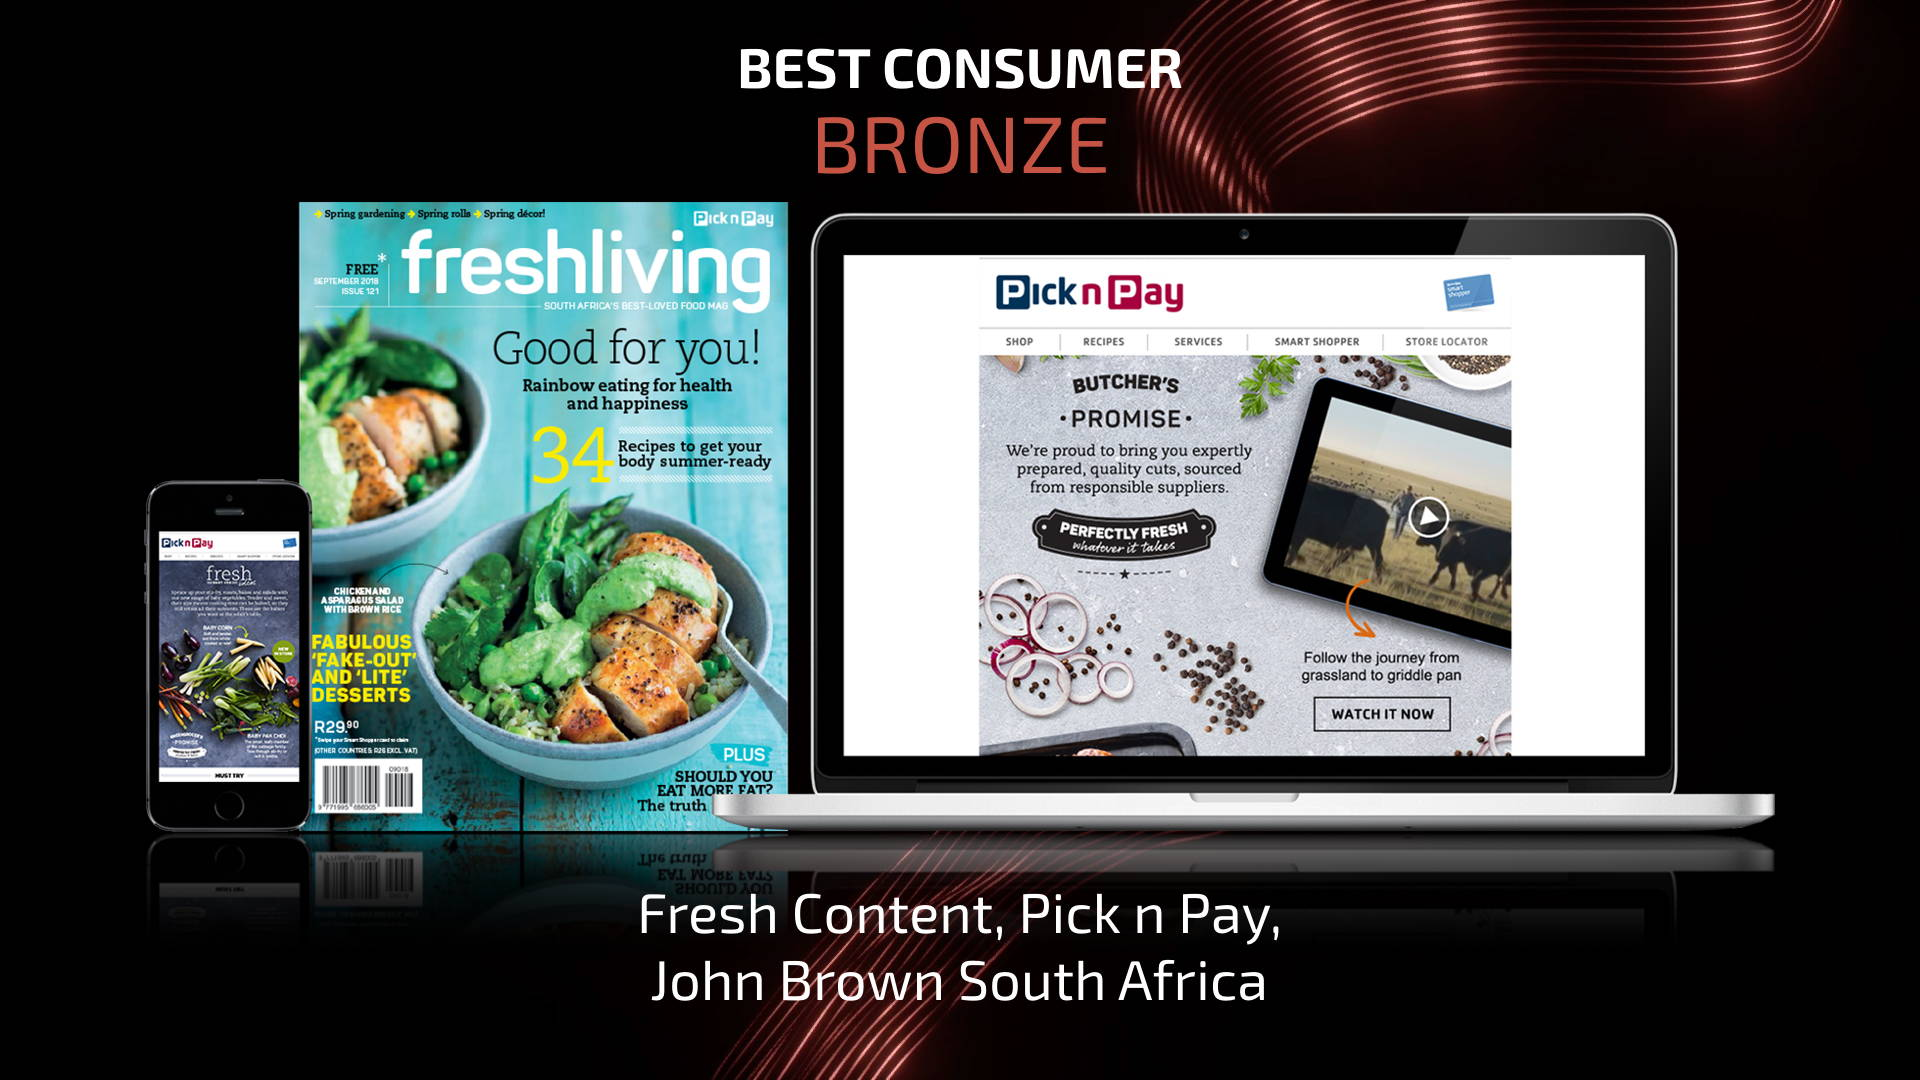 Best Consumer - Bronze